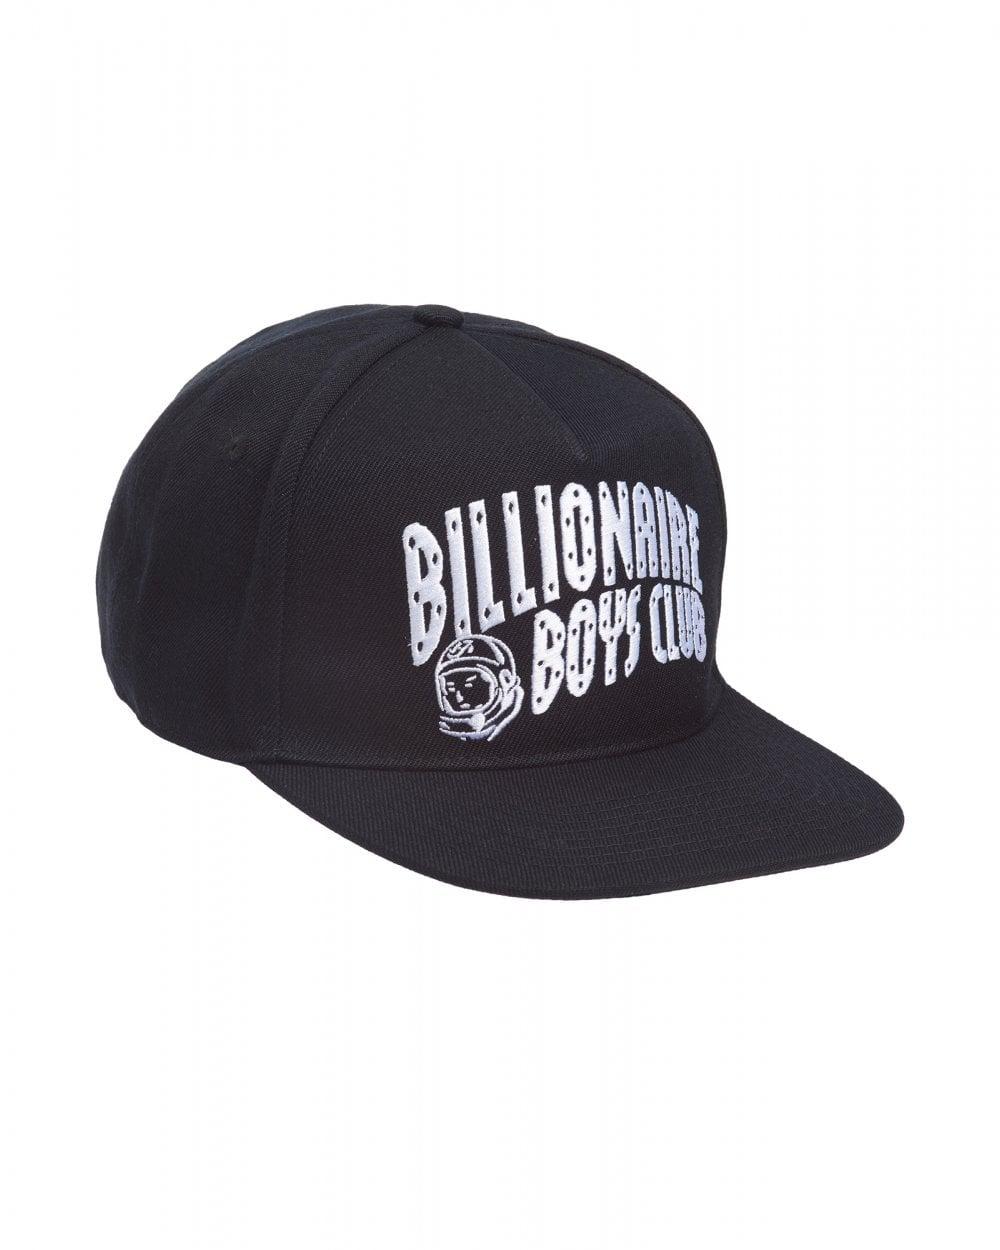 Billionaire Boys Club Mens Arch Logo Snapback Cap c1136345d7c2